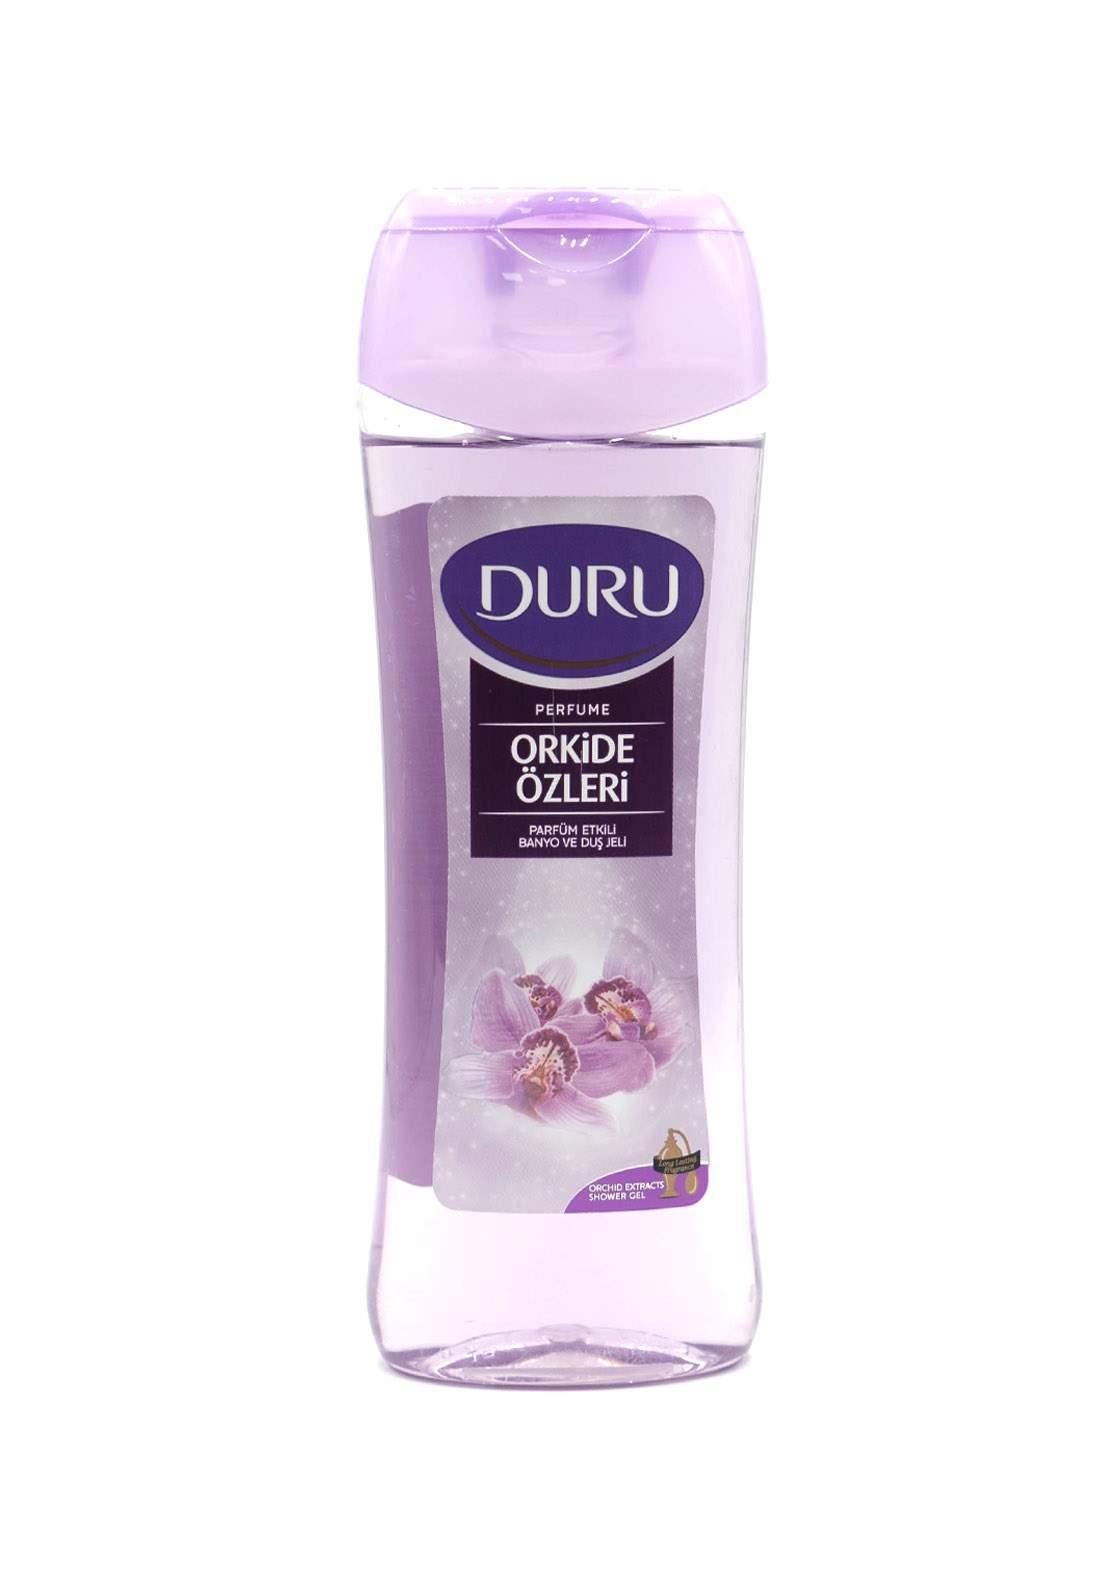 Duru Orchid Extract Perfume Shower Gel 450ml سائل استحمام